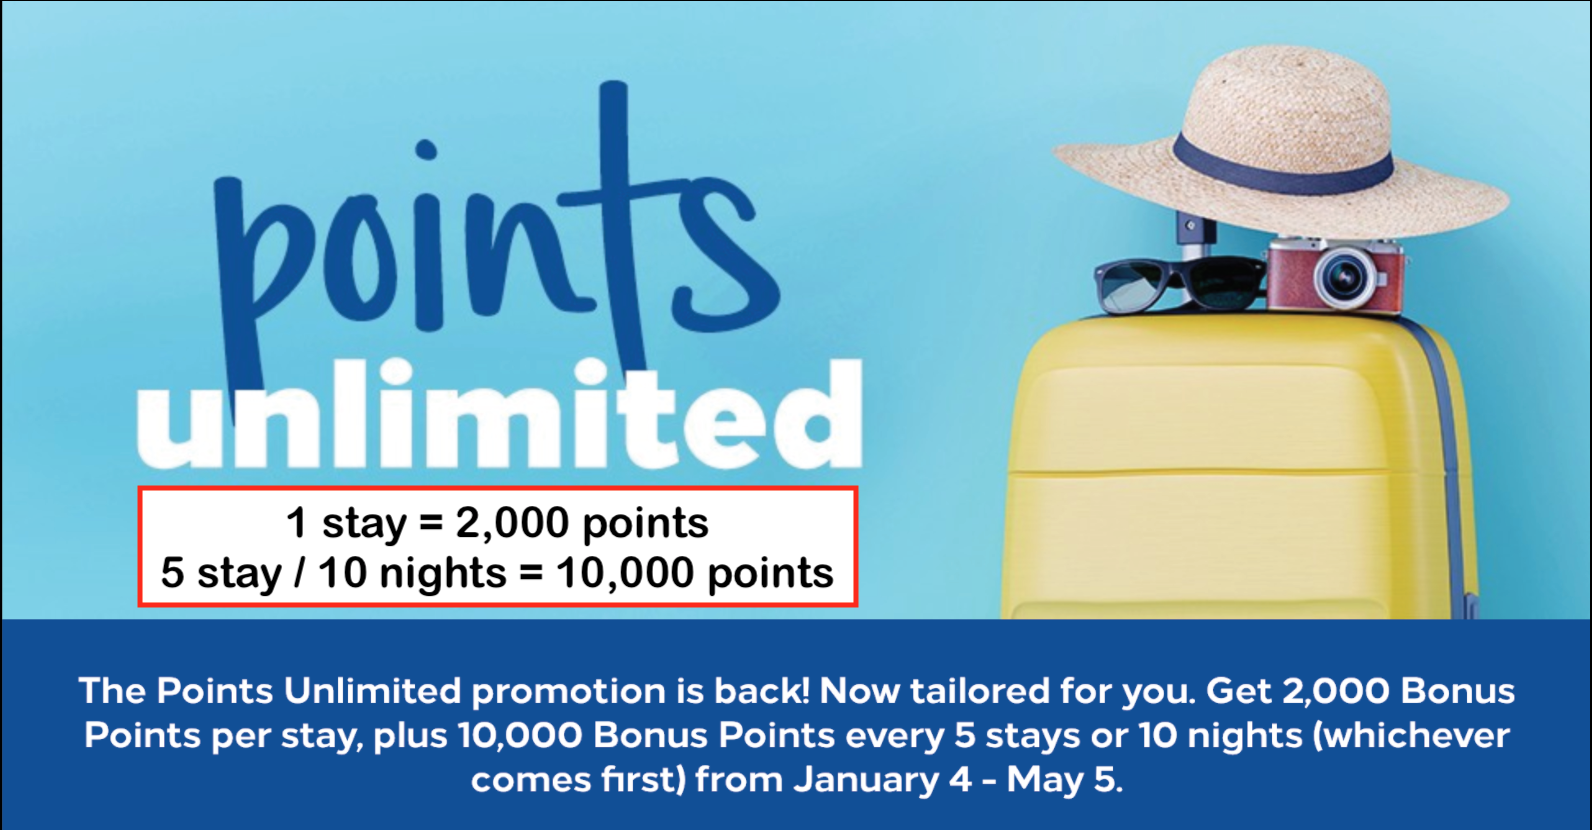 Hilton 希爾頓集團新優惠!1個入住 (stay) 即有2,000 points!每5個Stay或10個nights再多10,000 points!